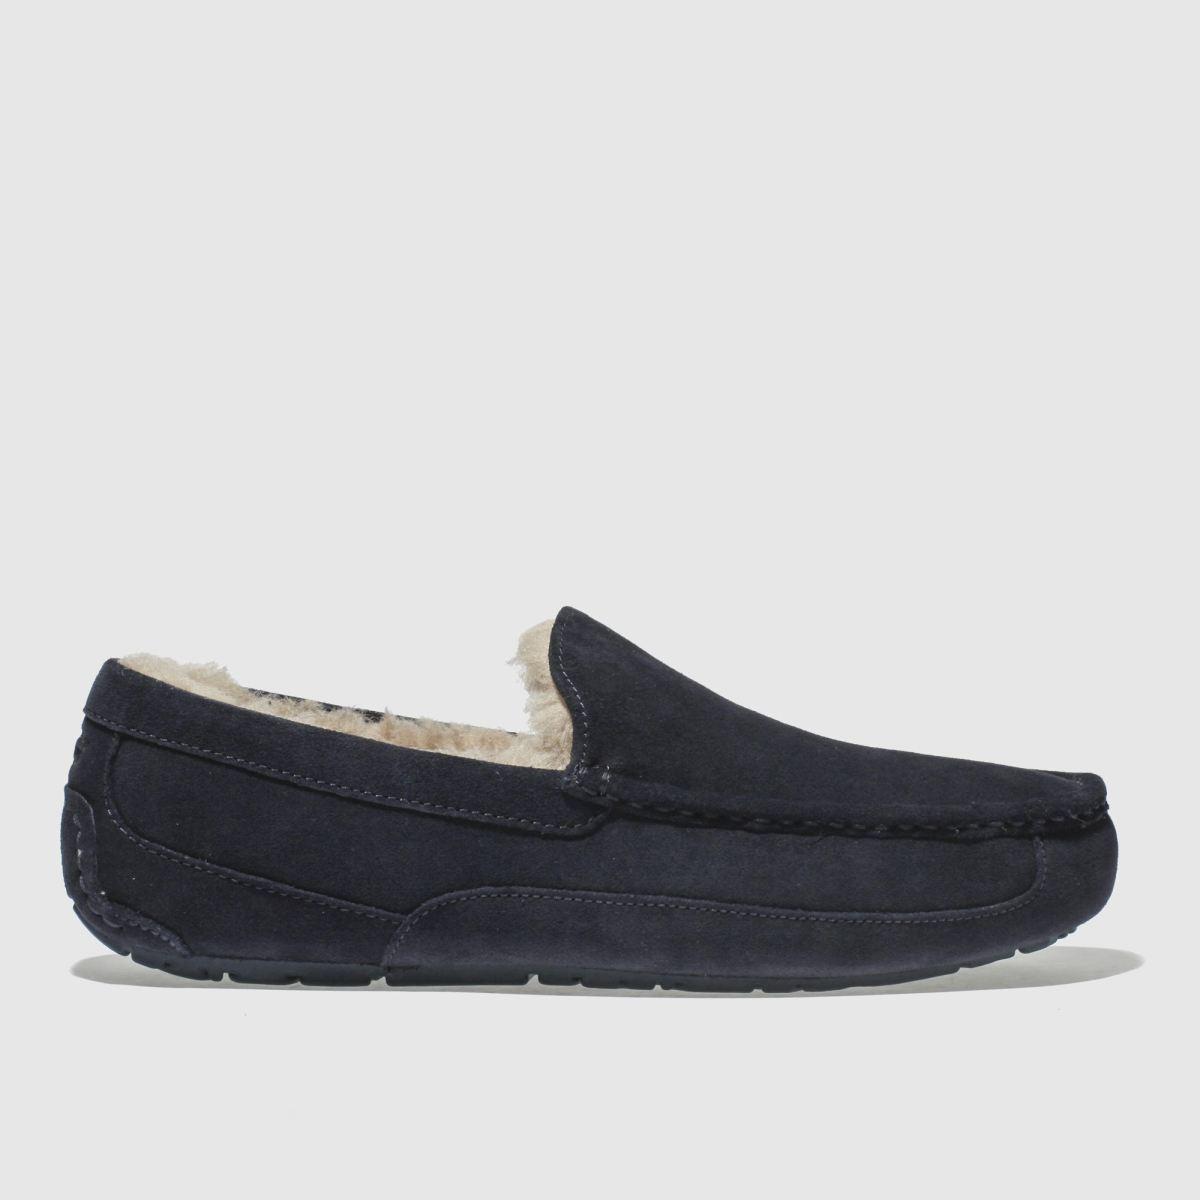 Ugg Navy Ascot Slippers